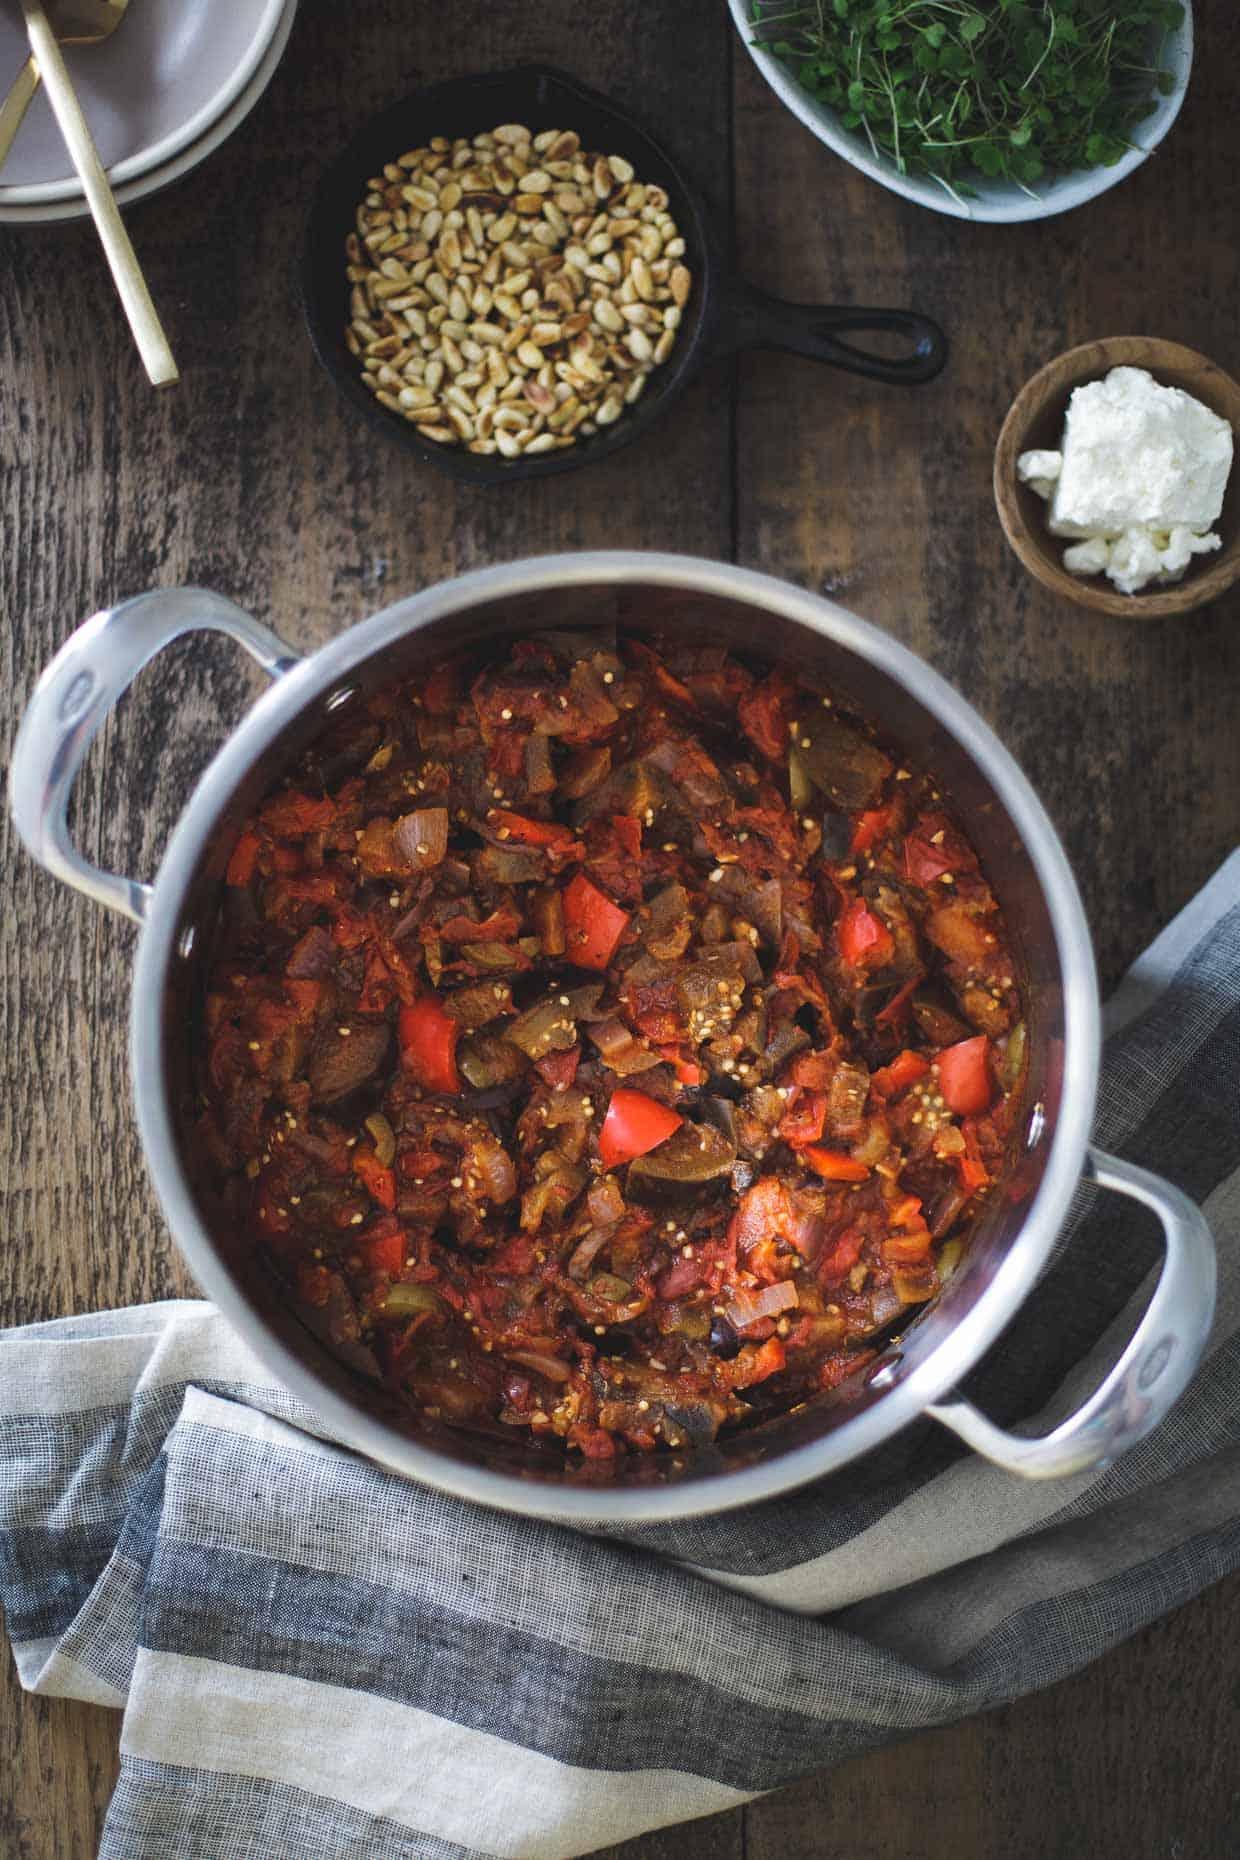 Tomato Eggplant Stew